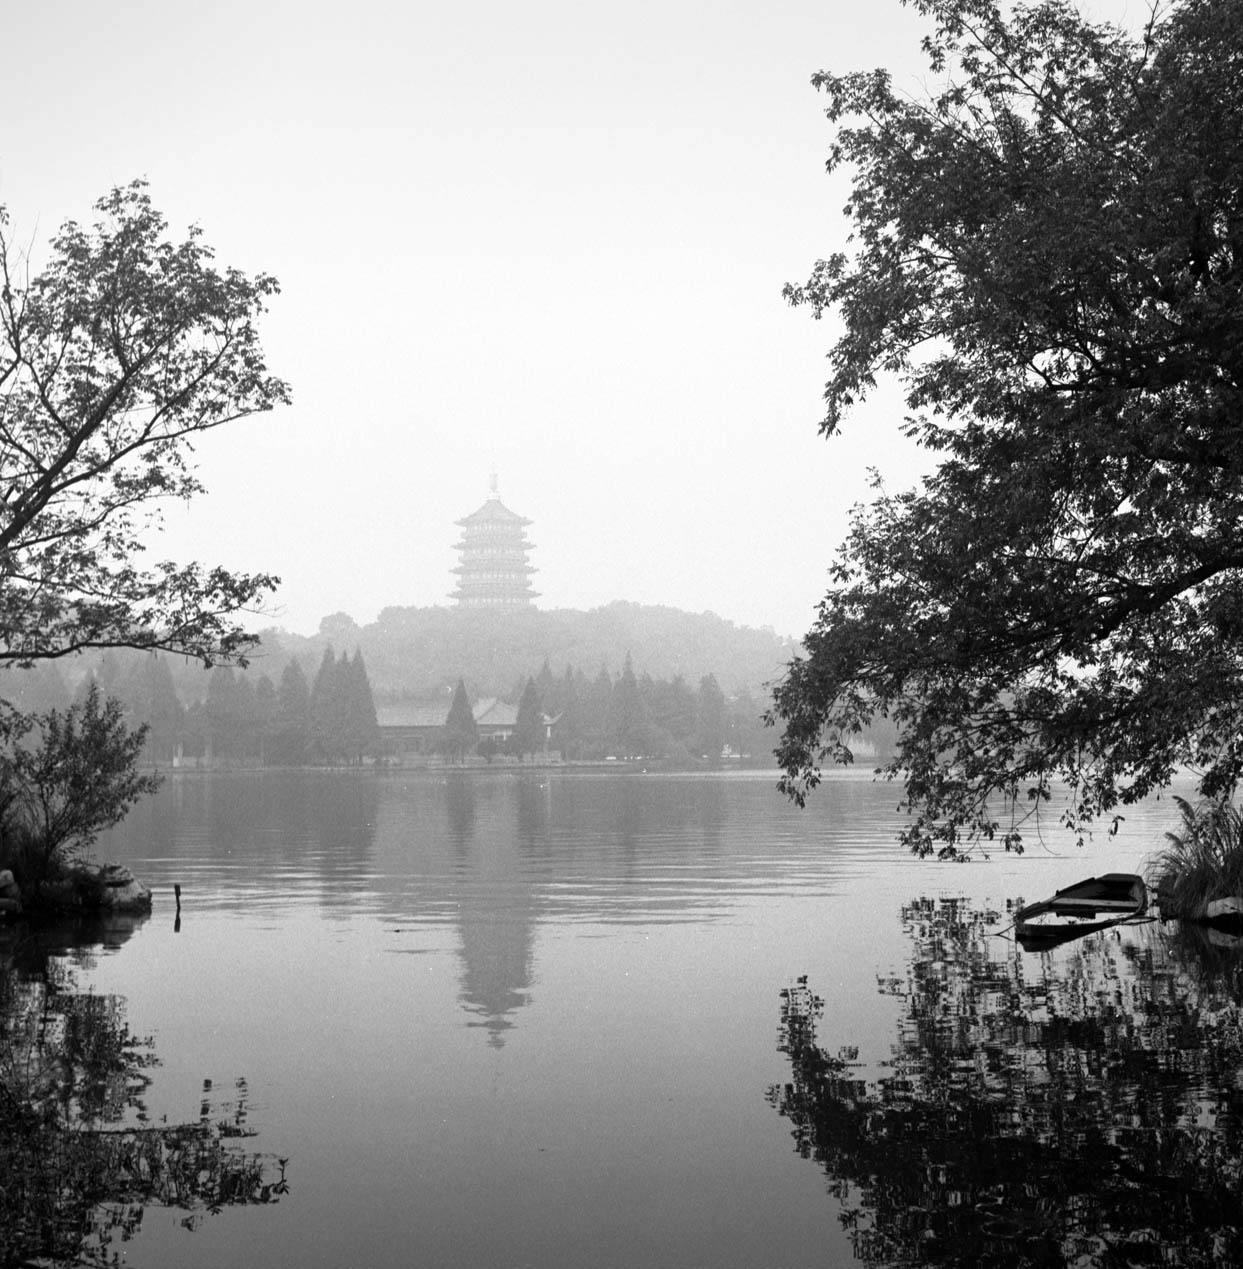 West lake IV, Hangzhou